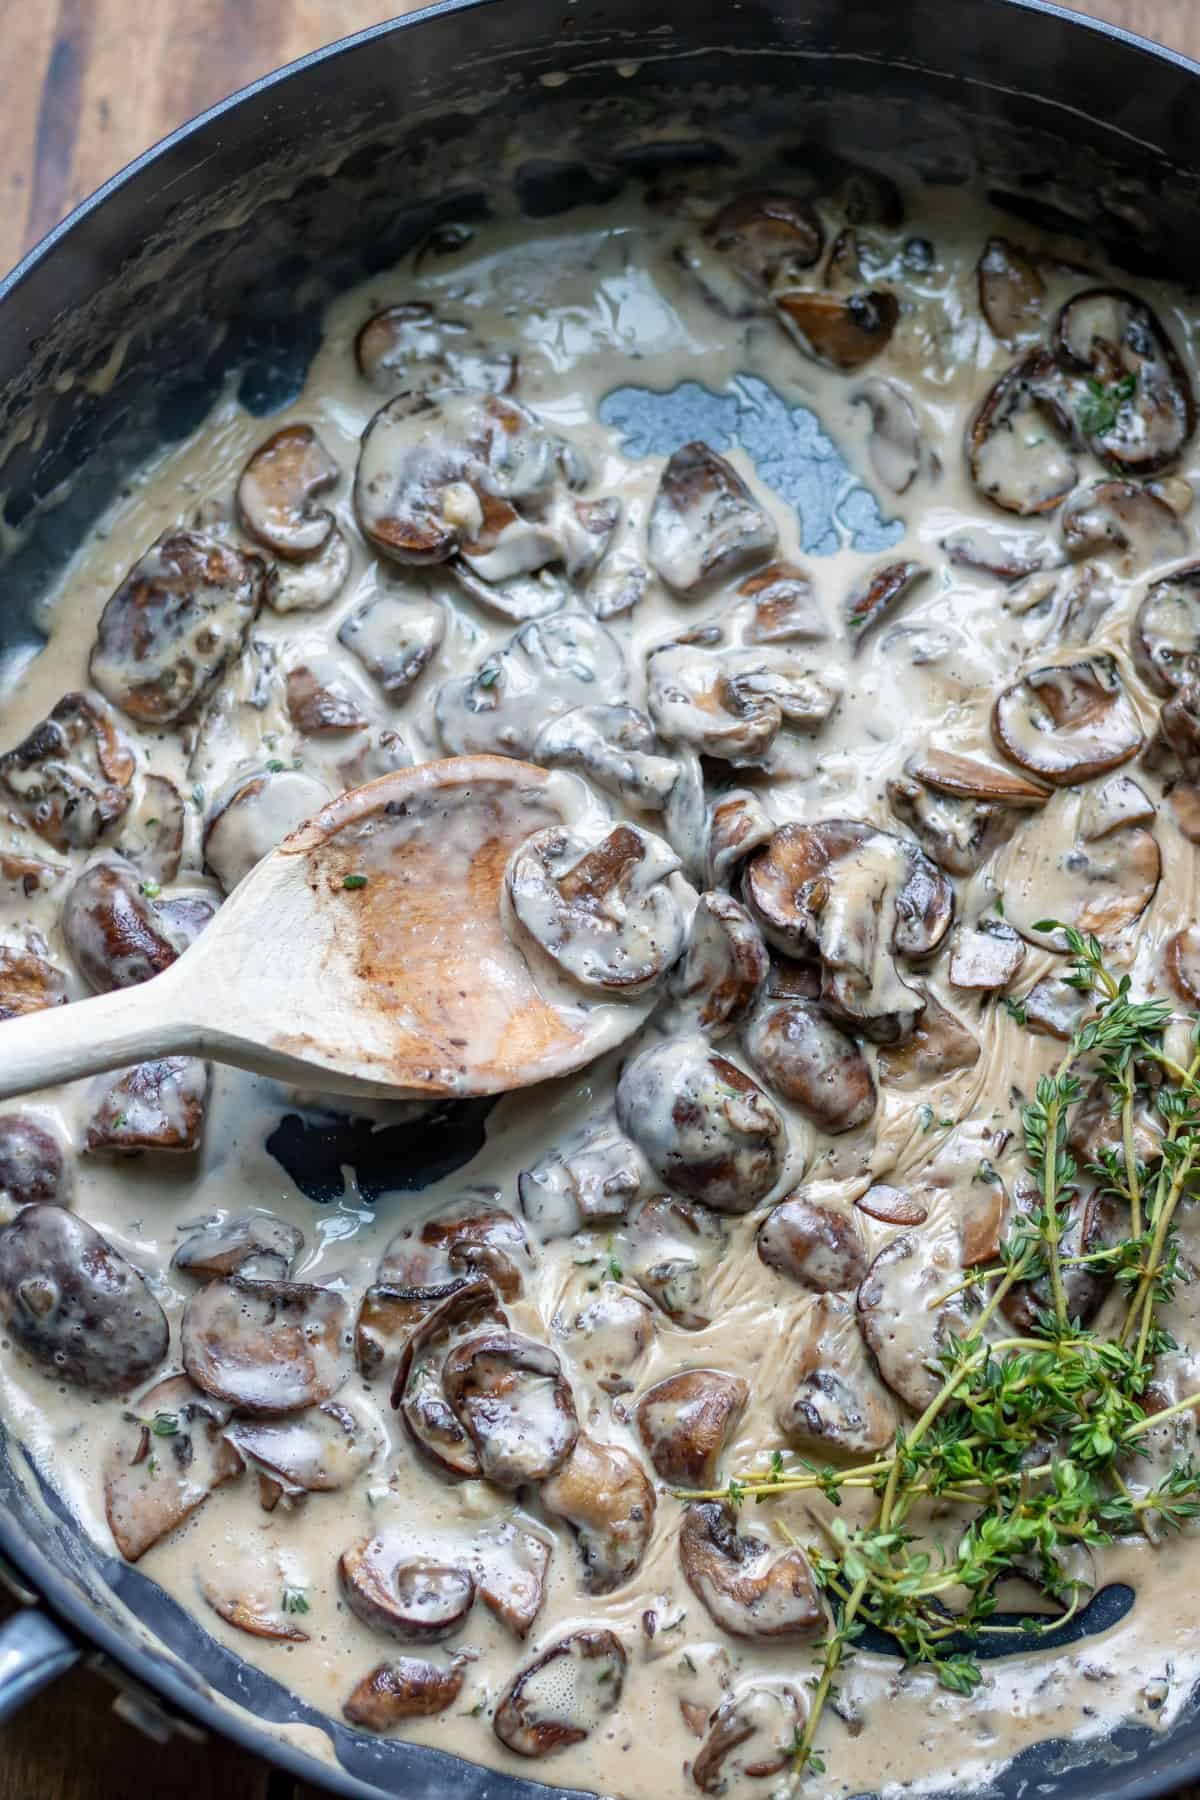 Spoon in a pan of creamy mushrooms.